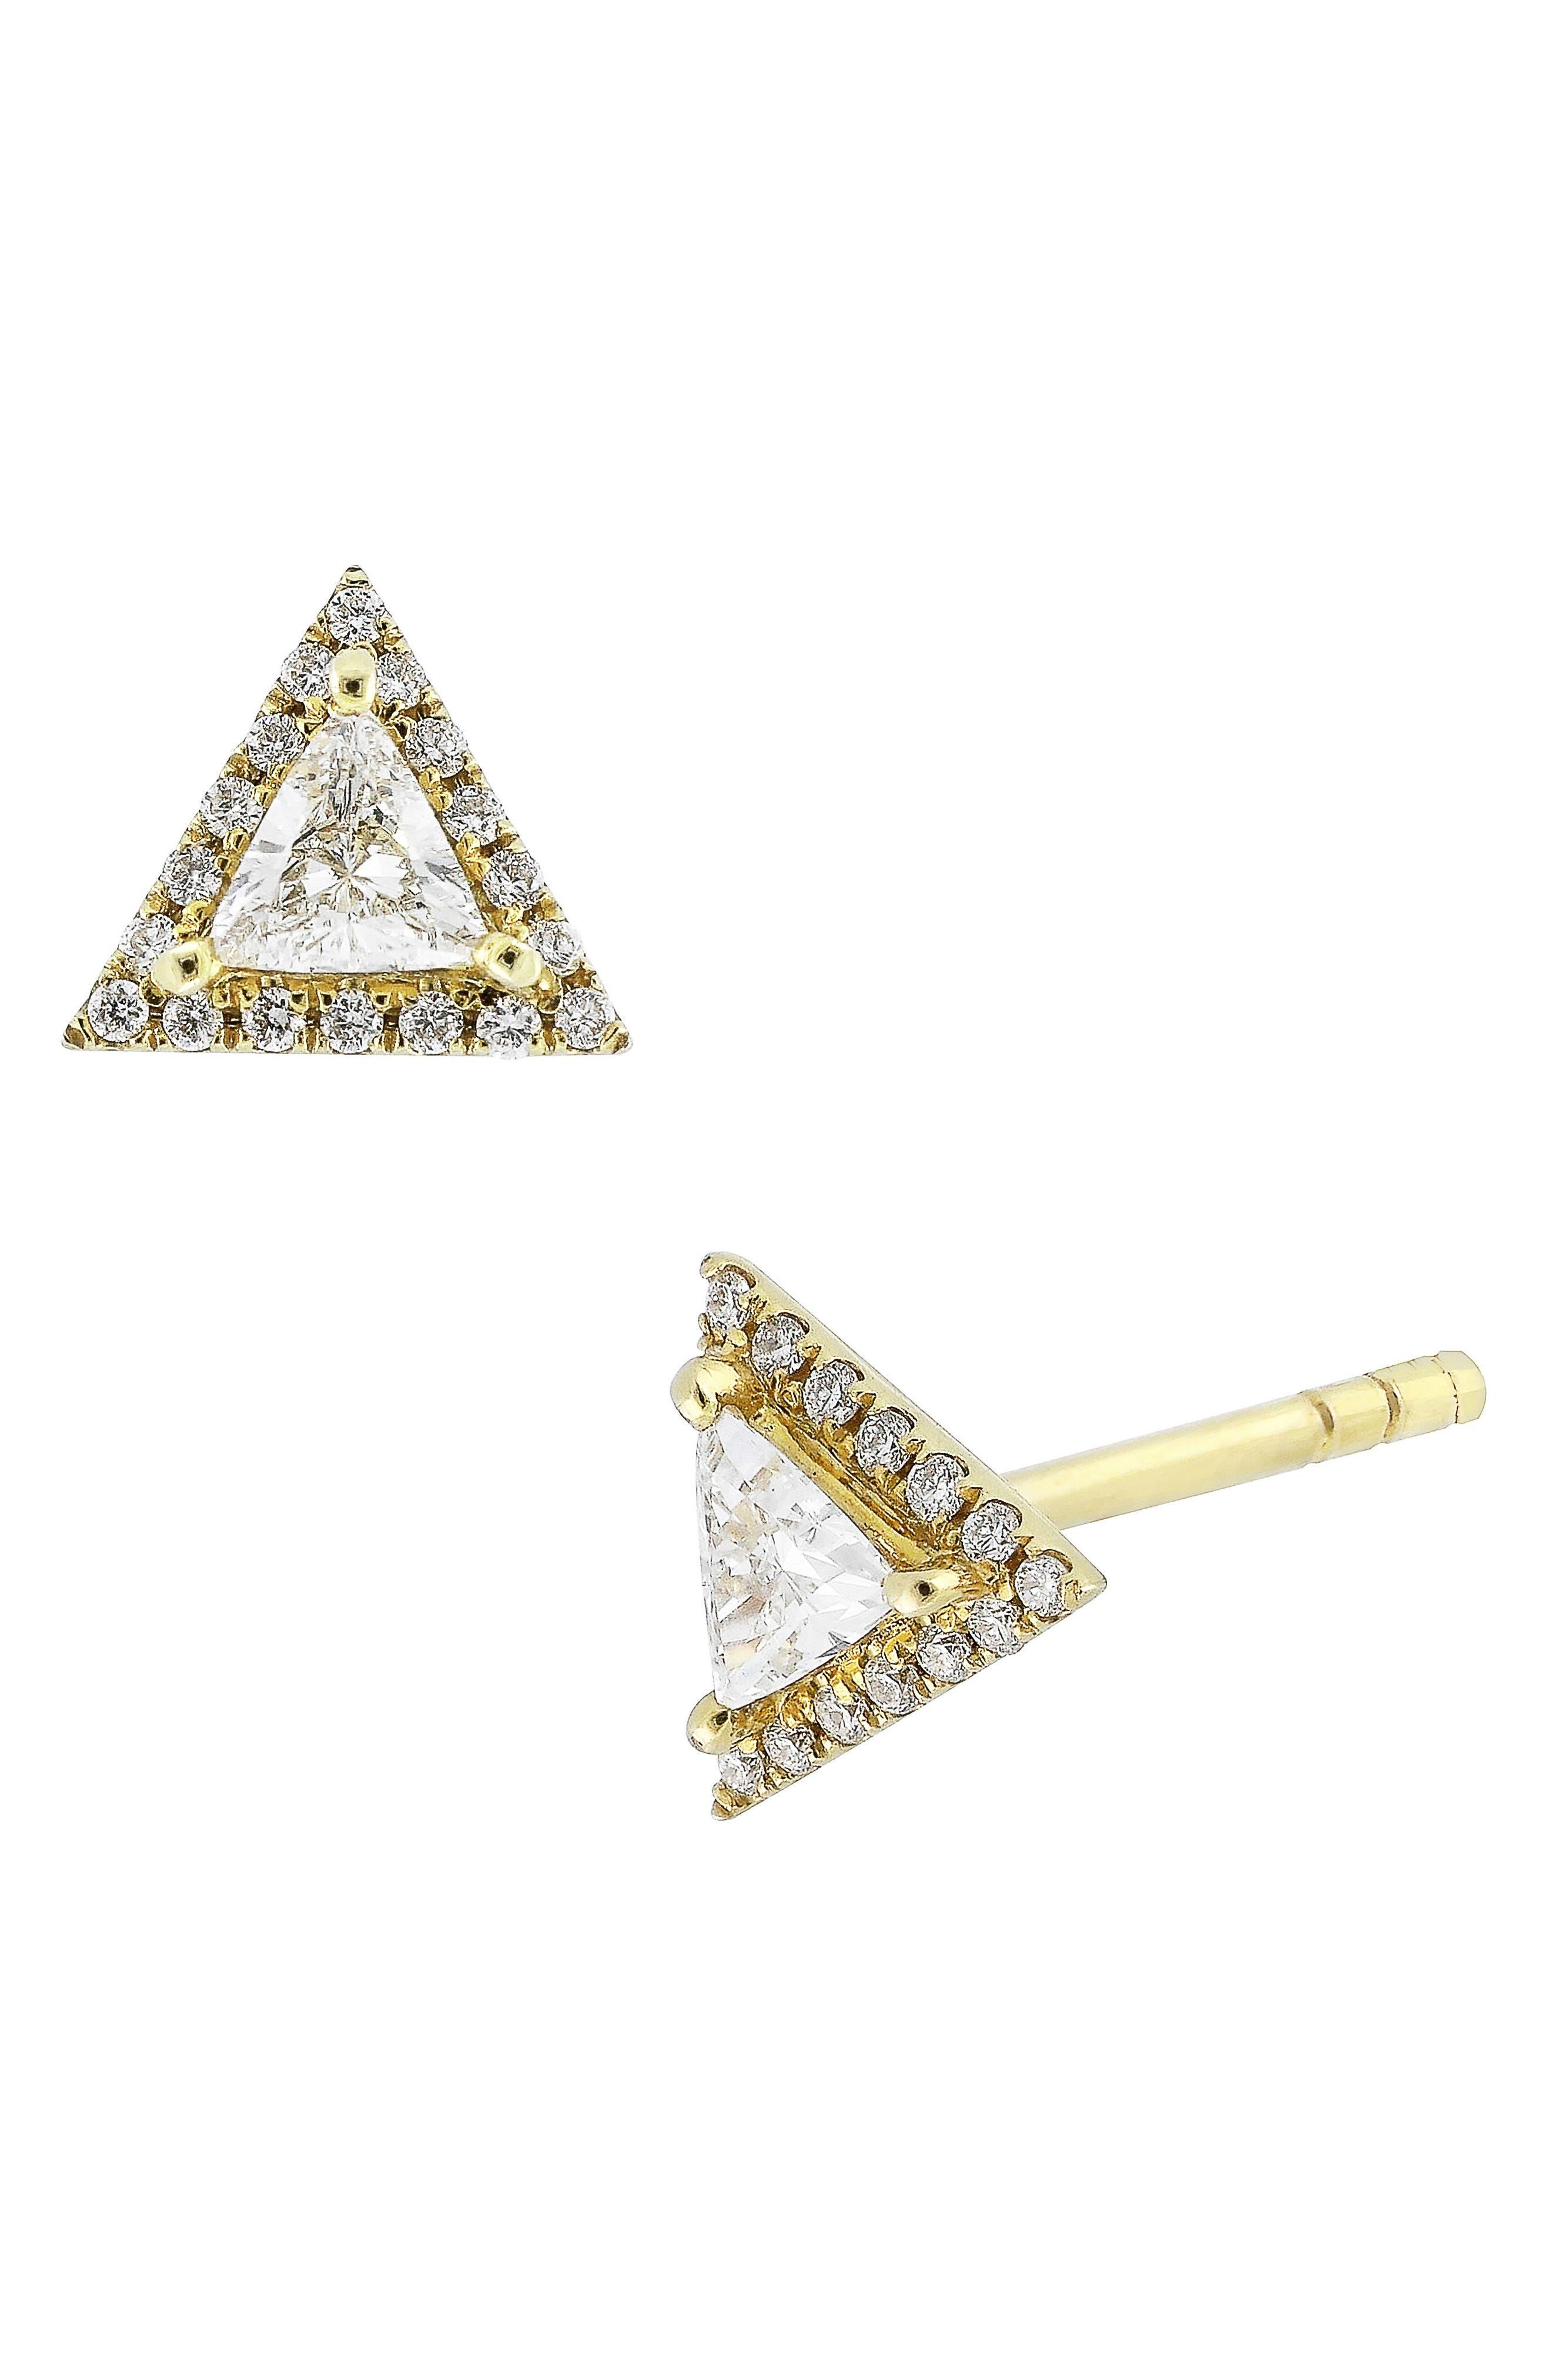 Diamond Triangle Stud Earrings,                             Main thumbnail 1, color,                             YELLOW GOLD